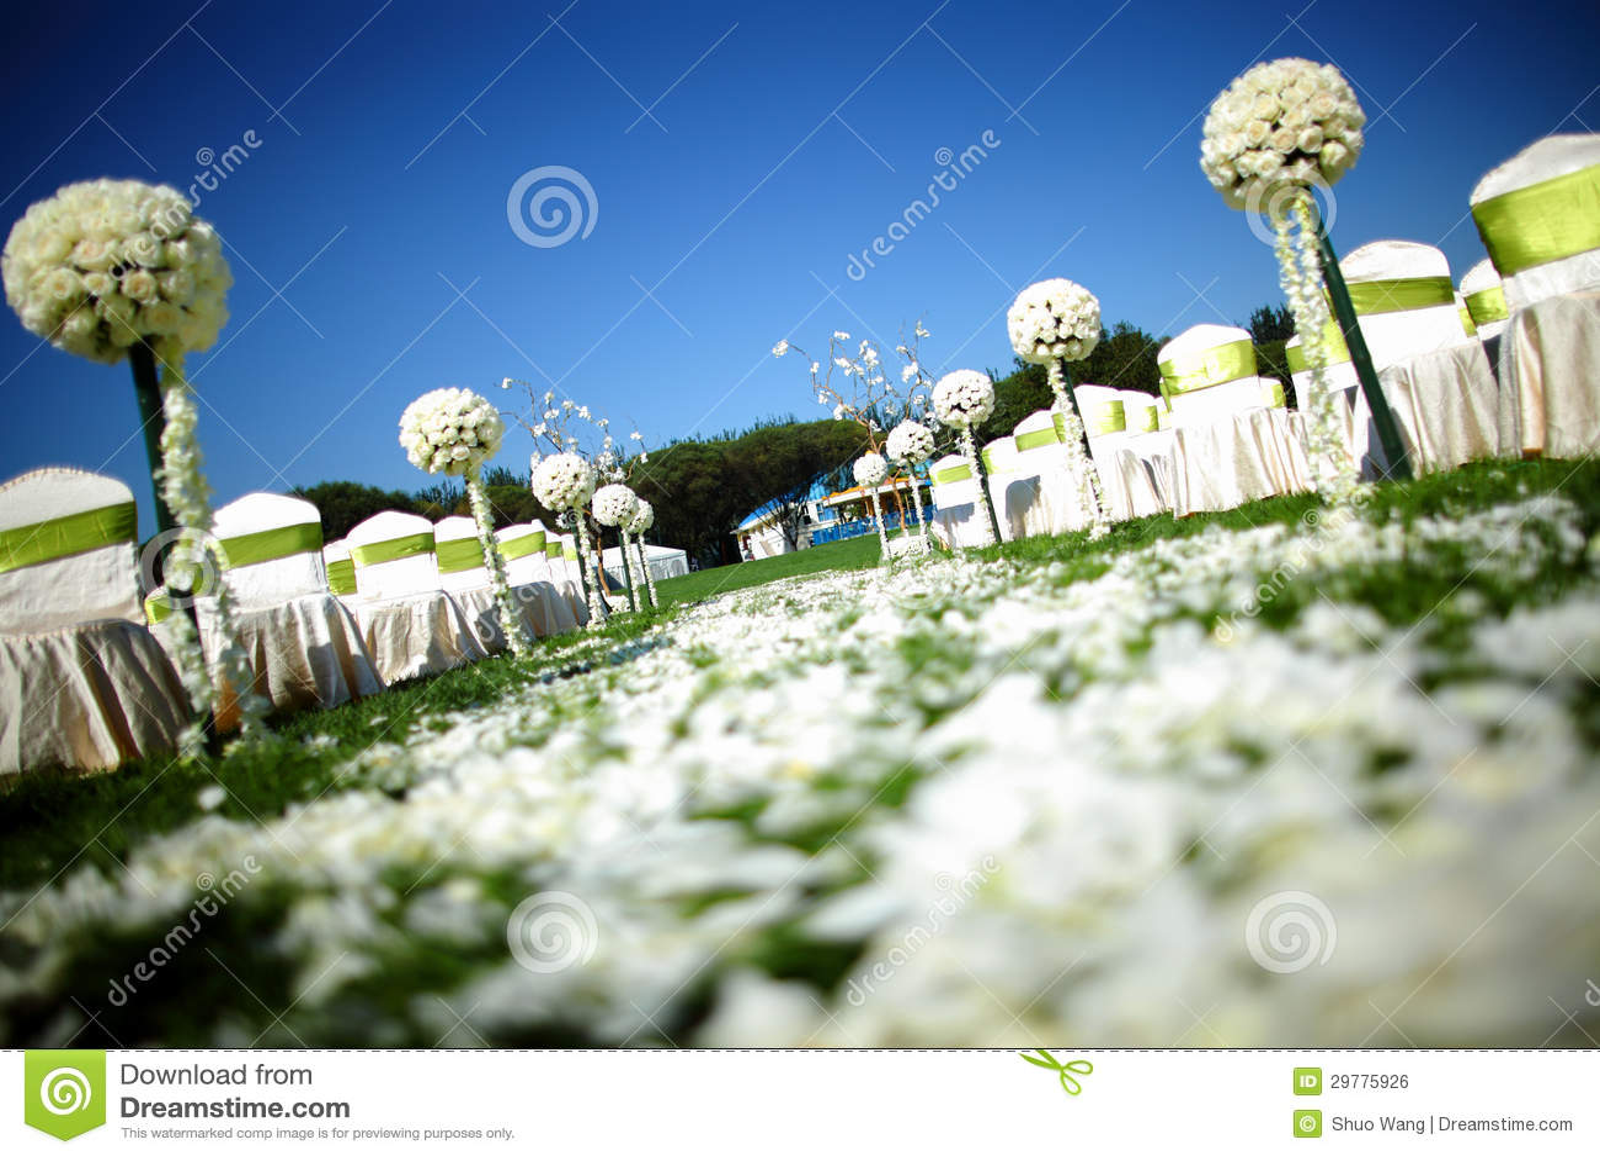 Outdoor Wedding Scene Royalty Free Stock Image - Image: 29775926